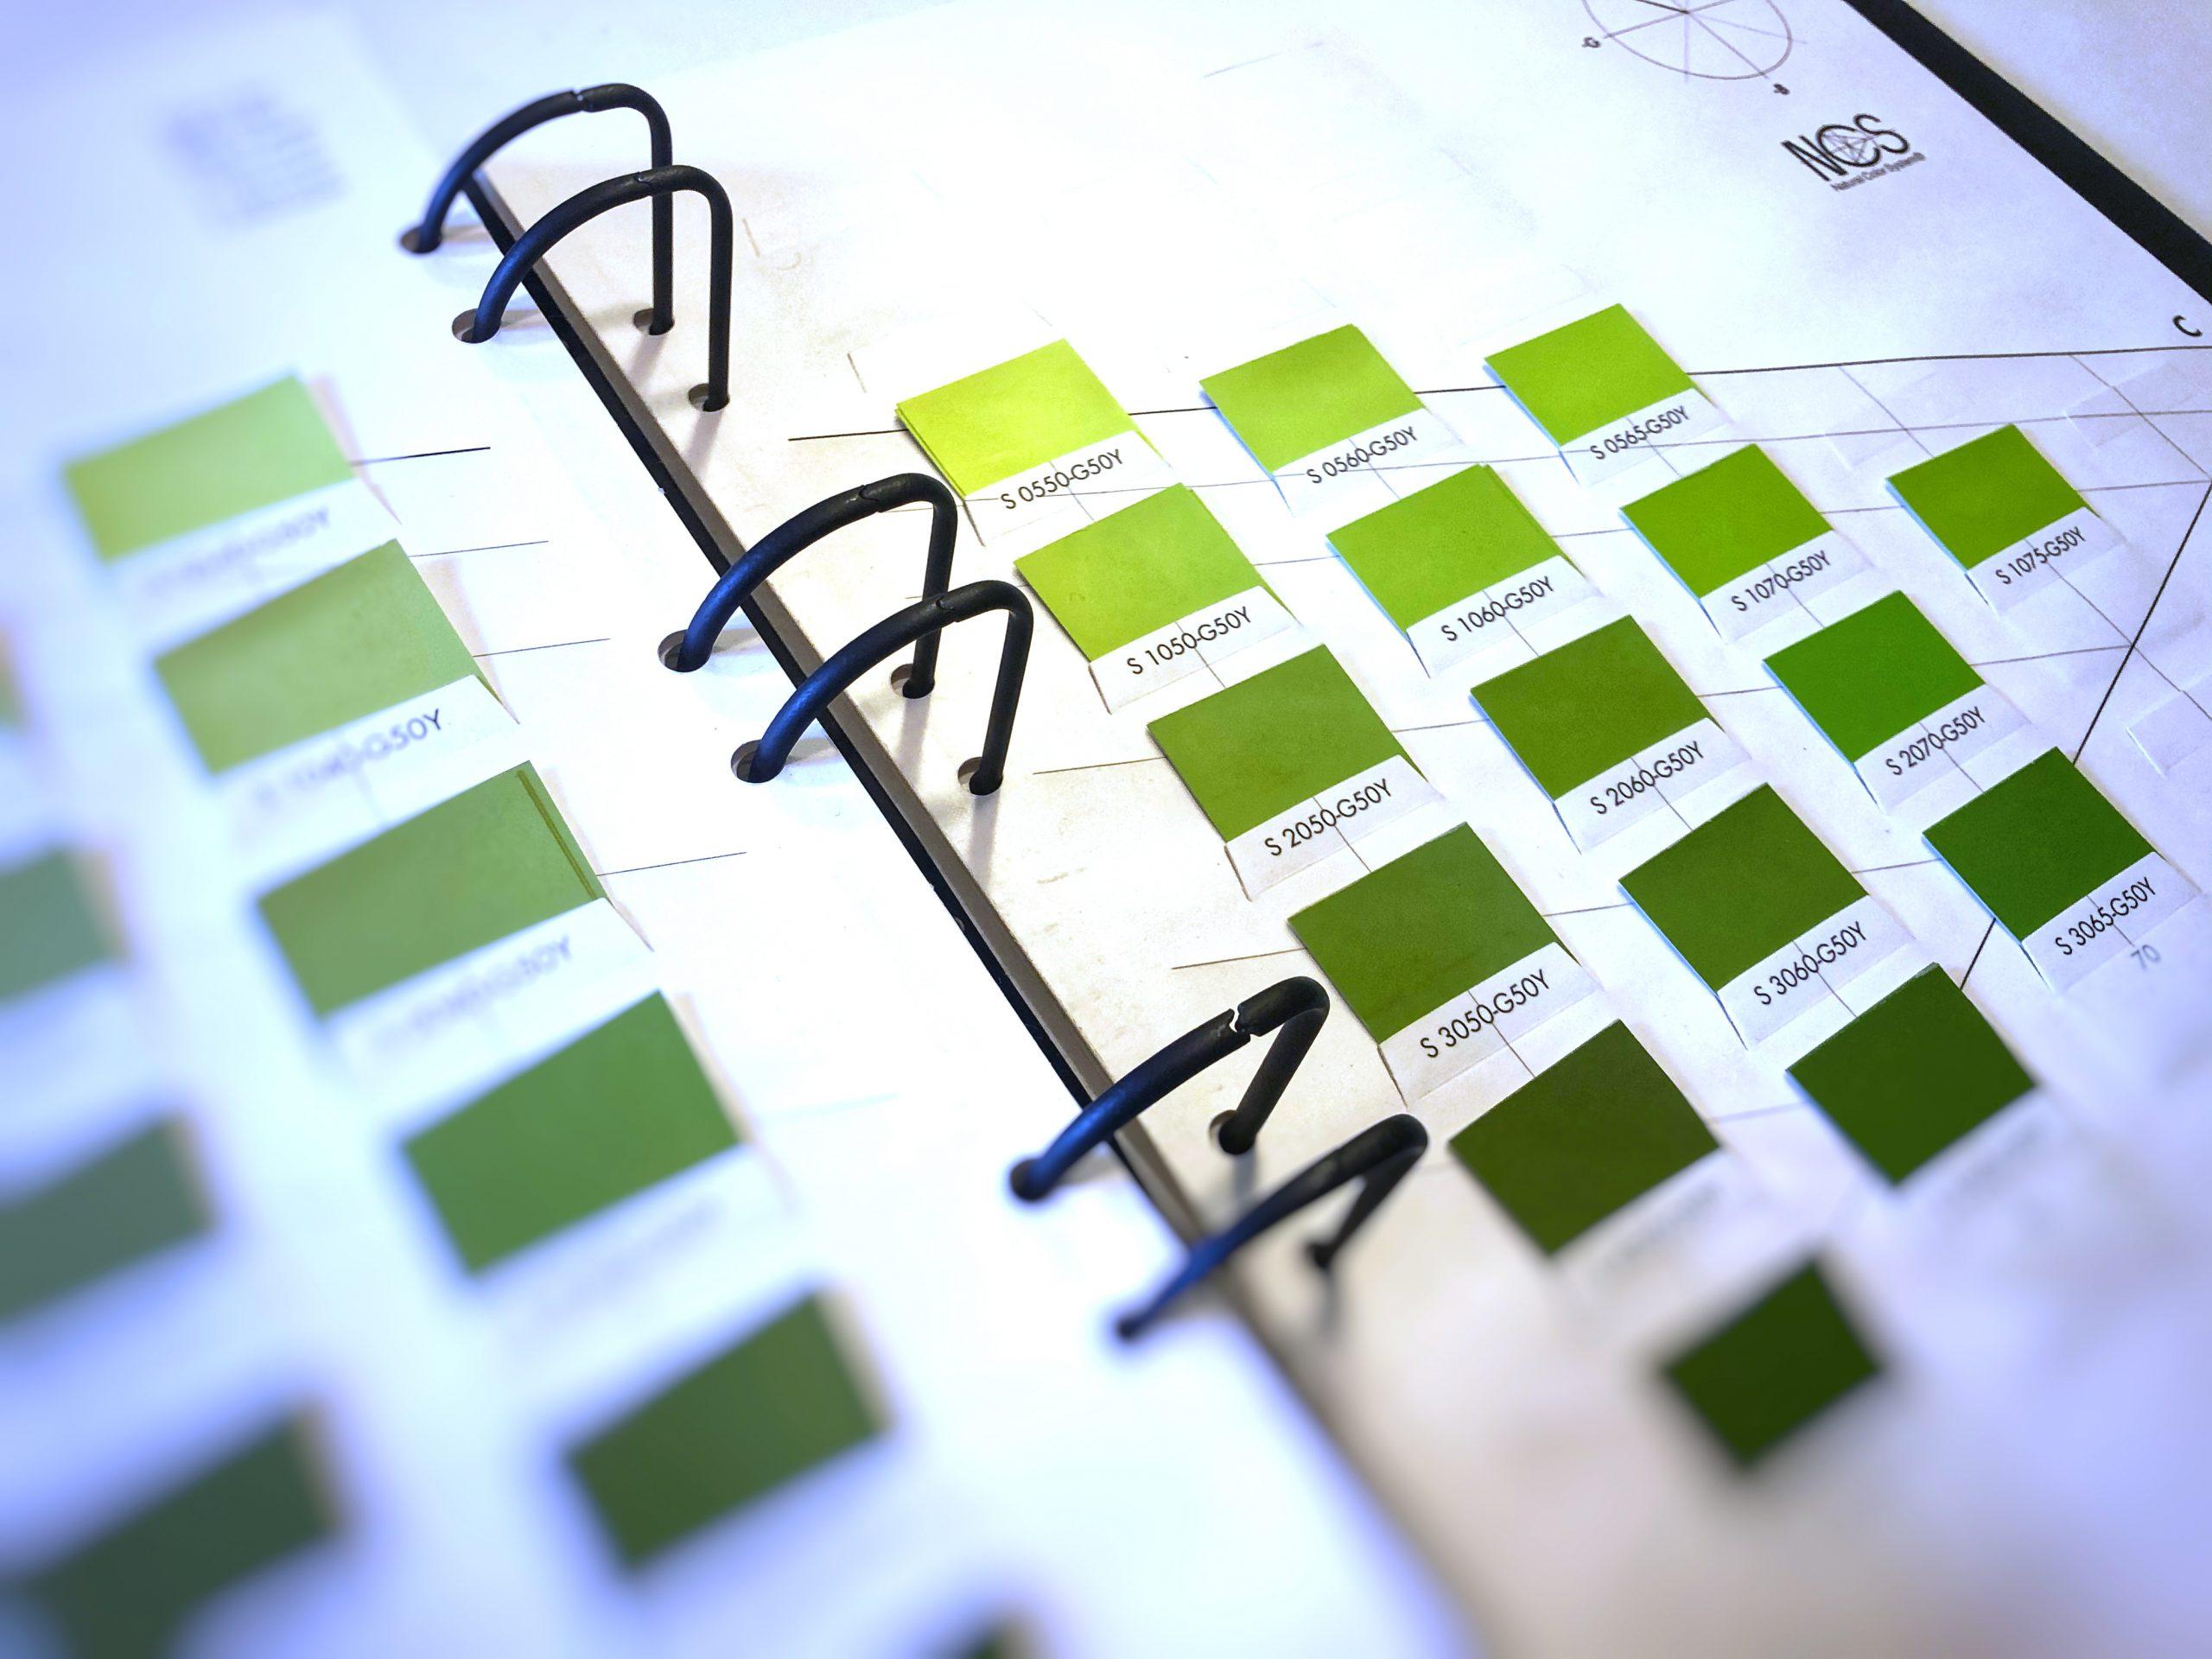 Farbdesign. Farbkonzepte. NCS System.